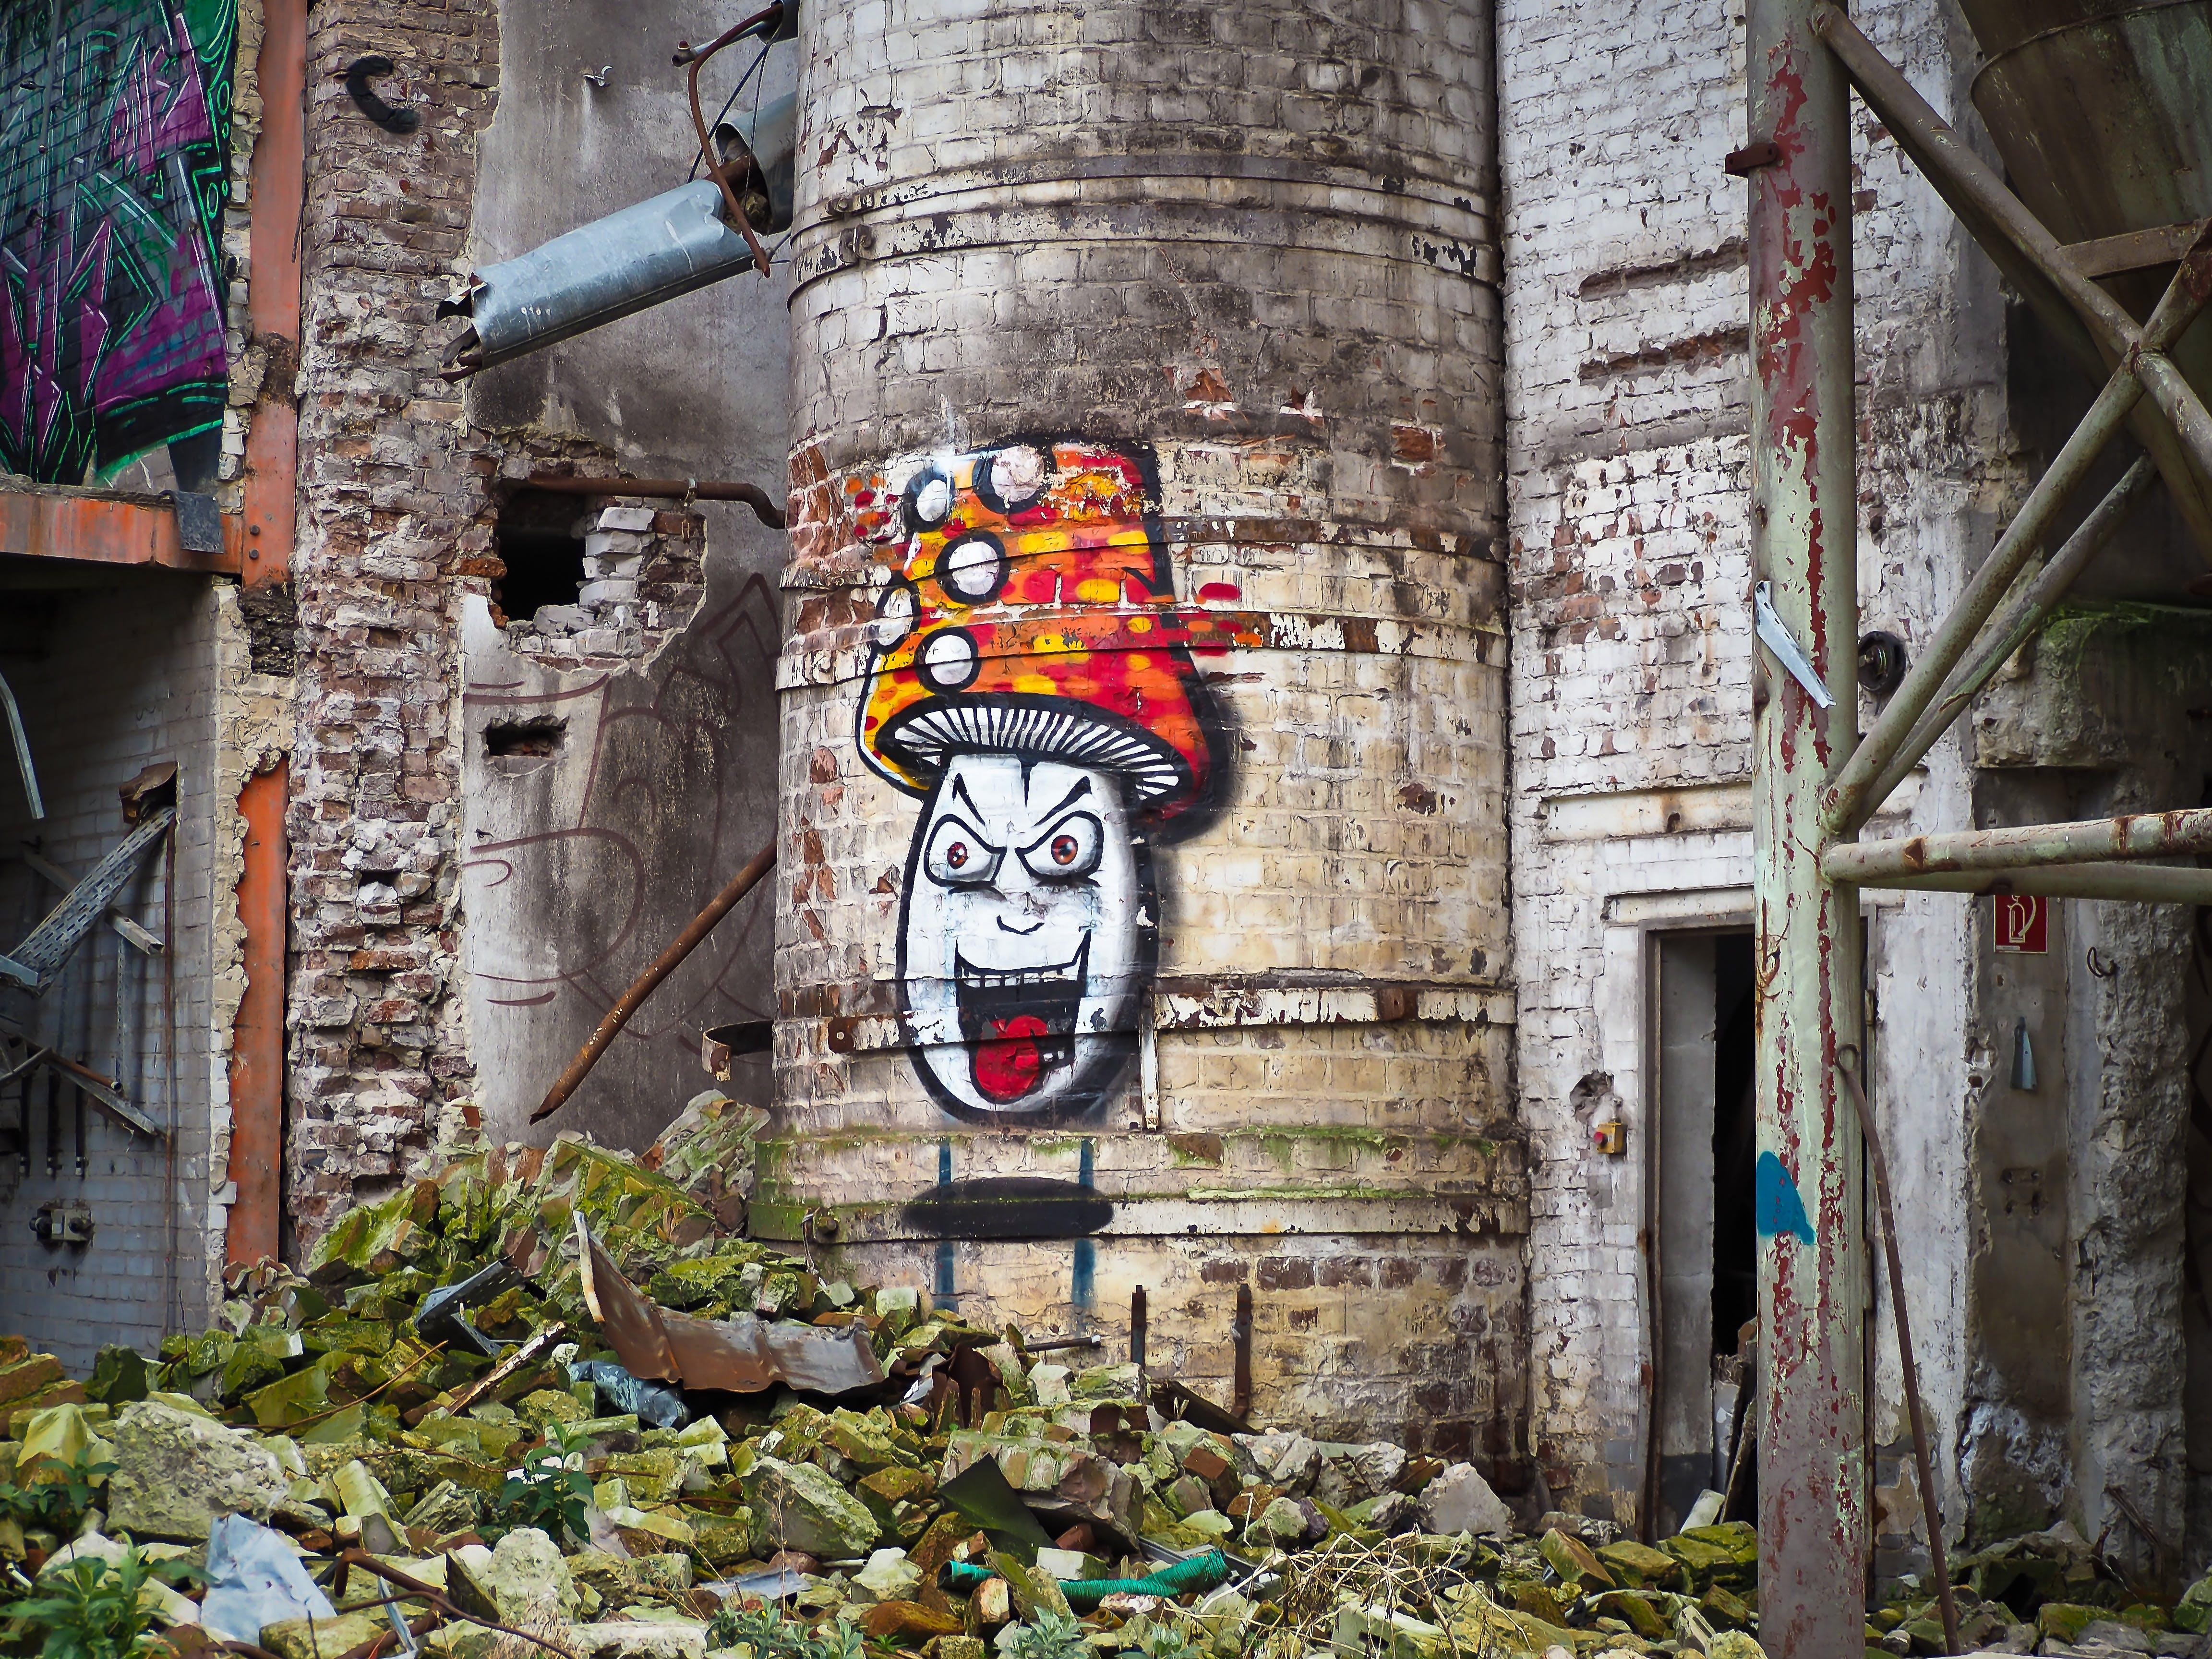 Mushroom Graffiti on Concrete Building during Daytime